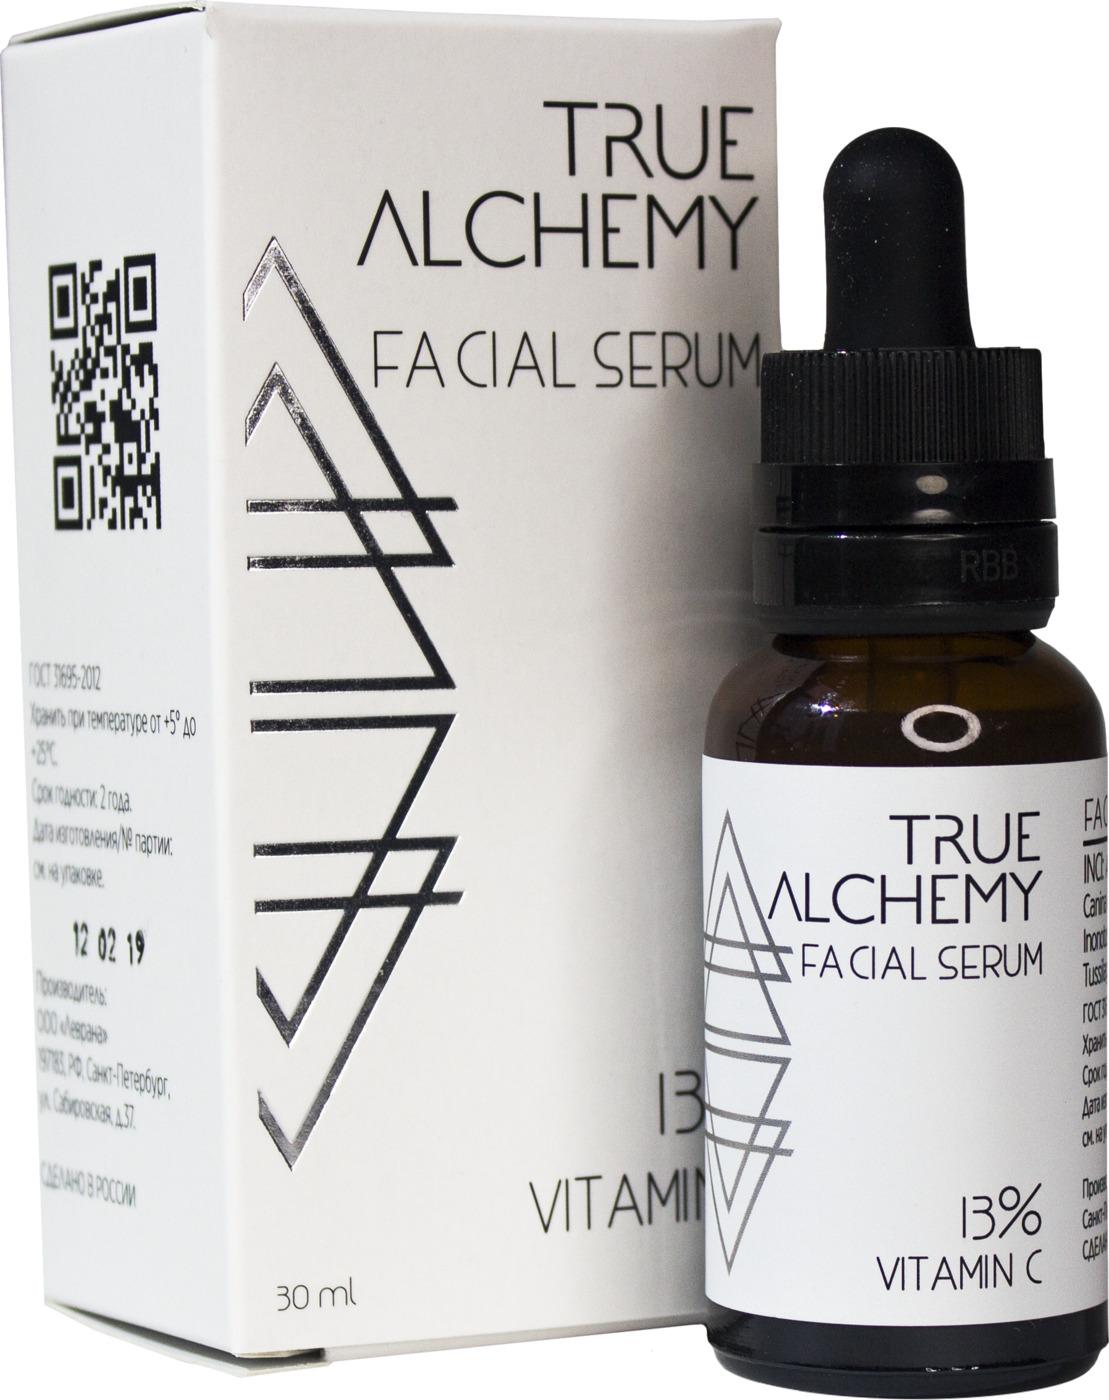 True Alchemy Сыворотка Vitamin C 13%, 30 мл